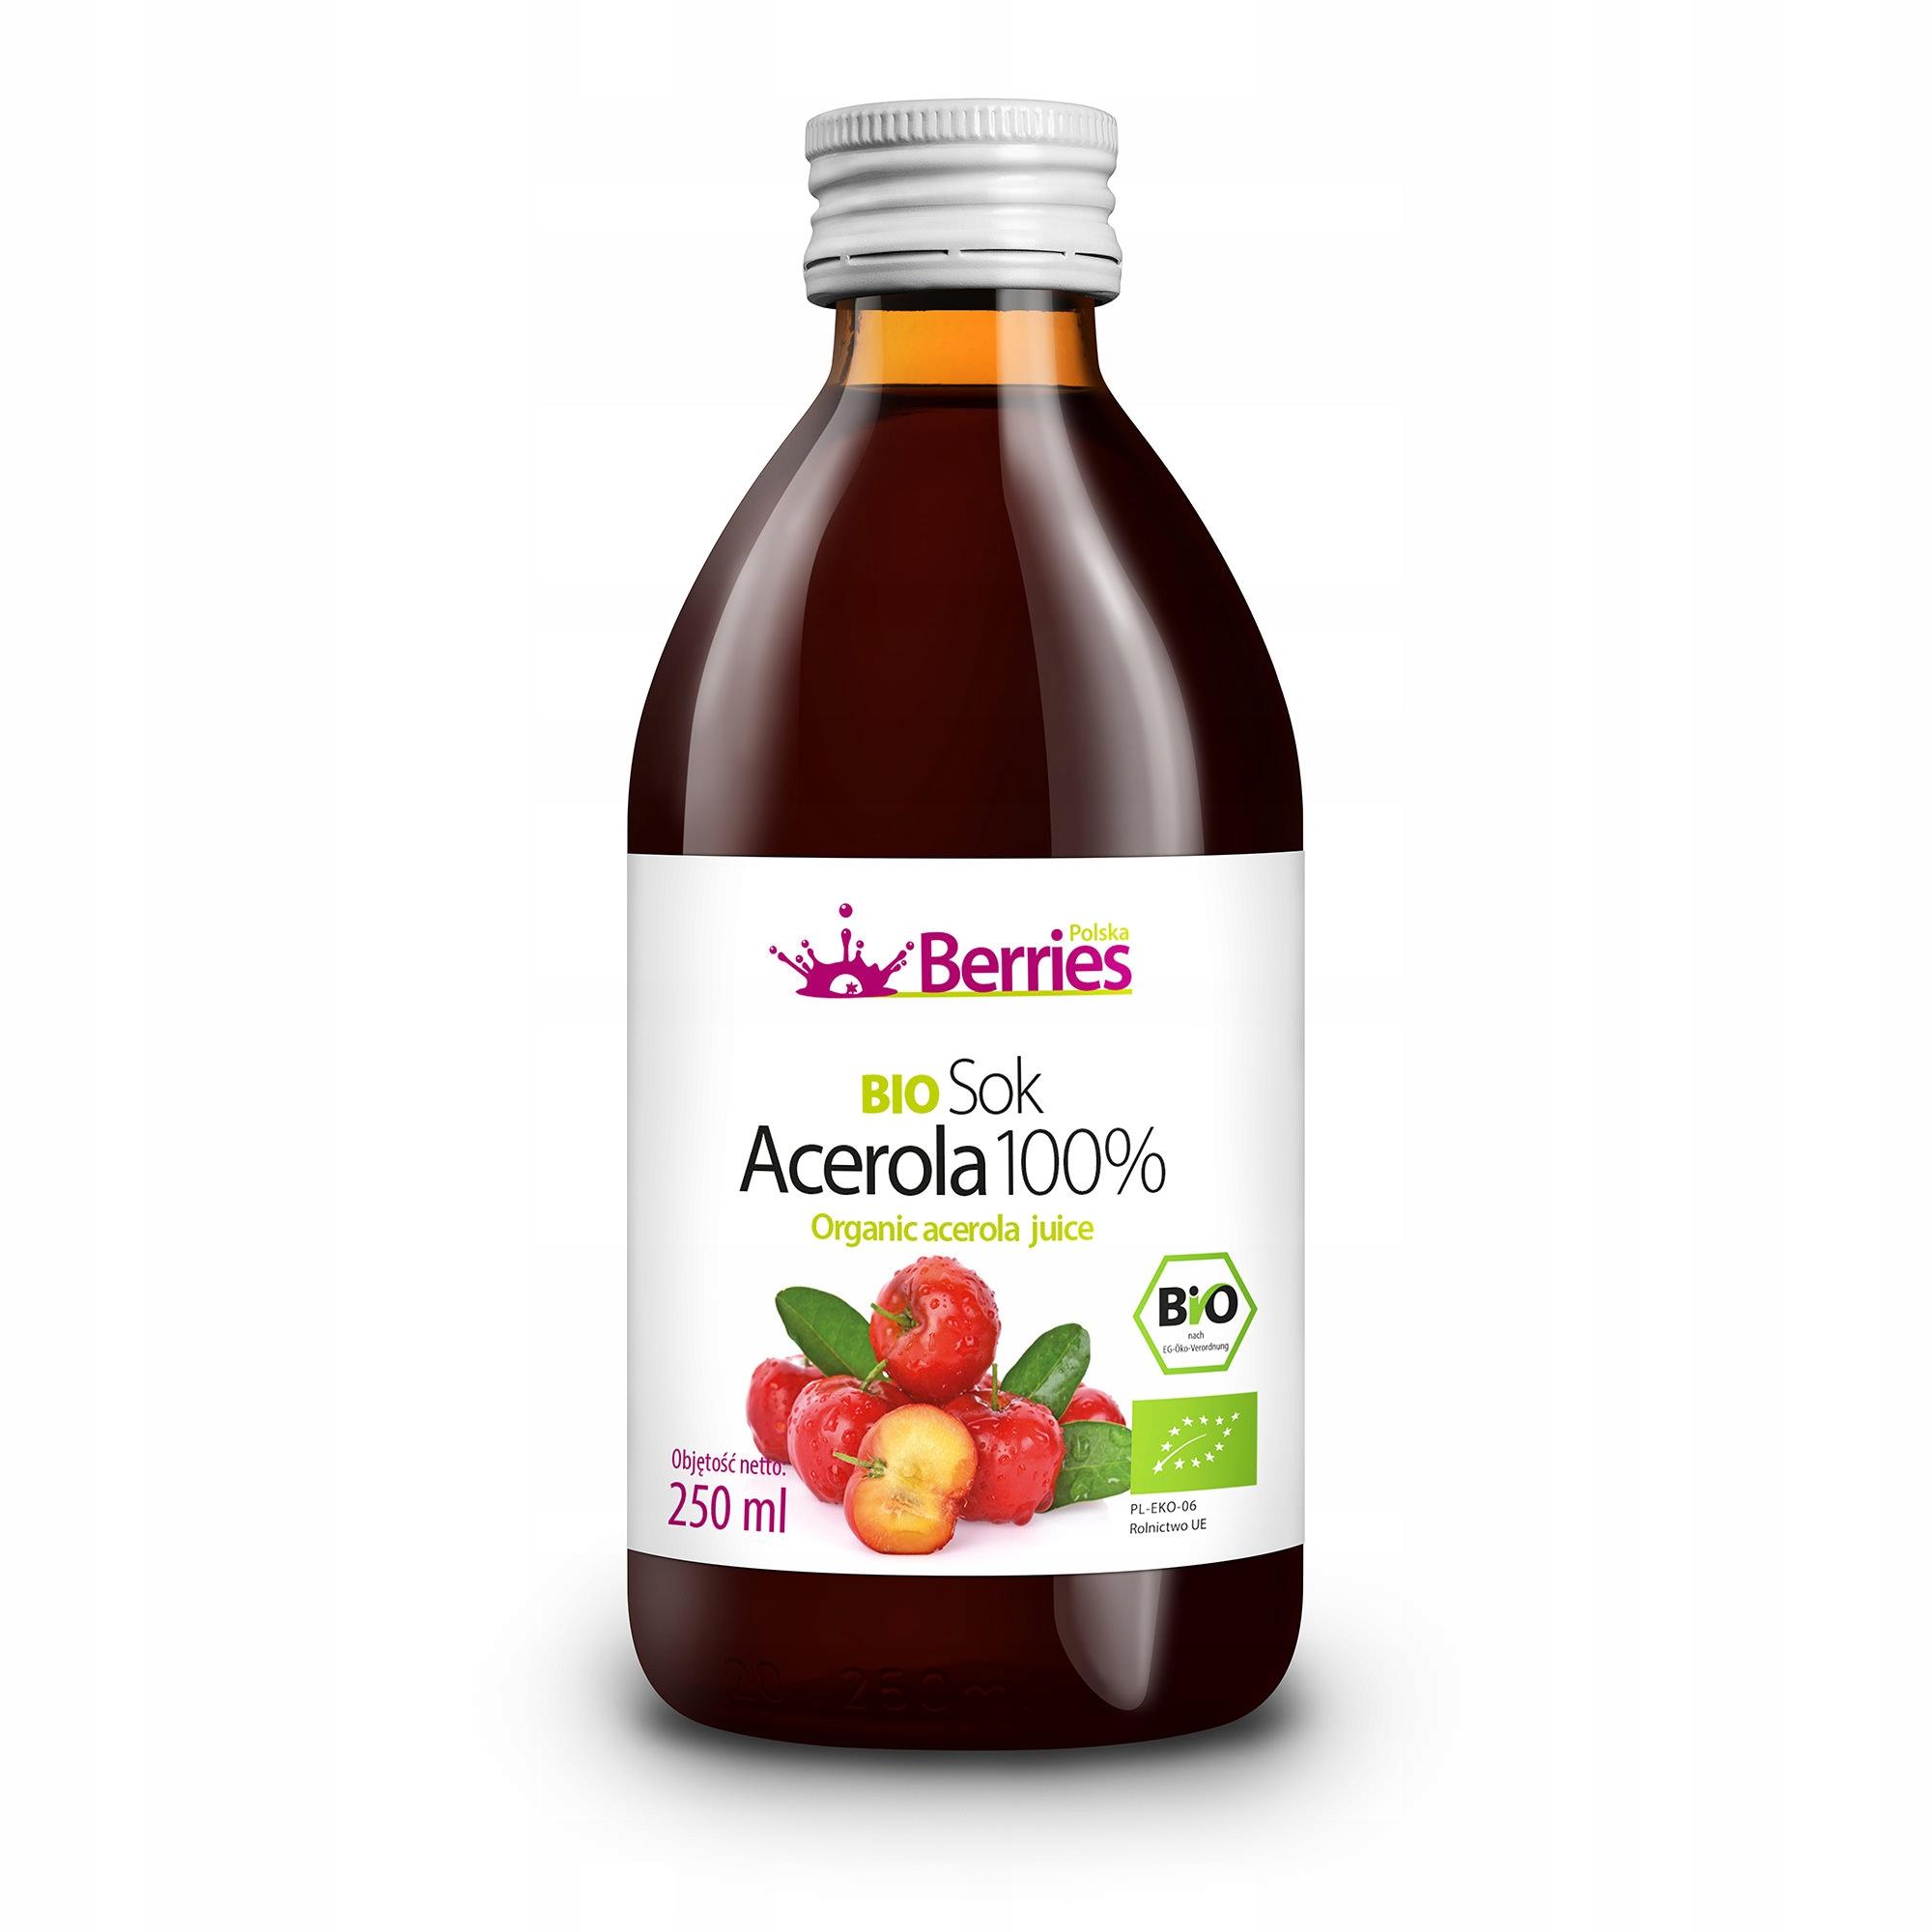 Sok BIO Acerola 100% sok z aceroli 250ml